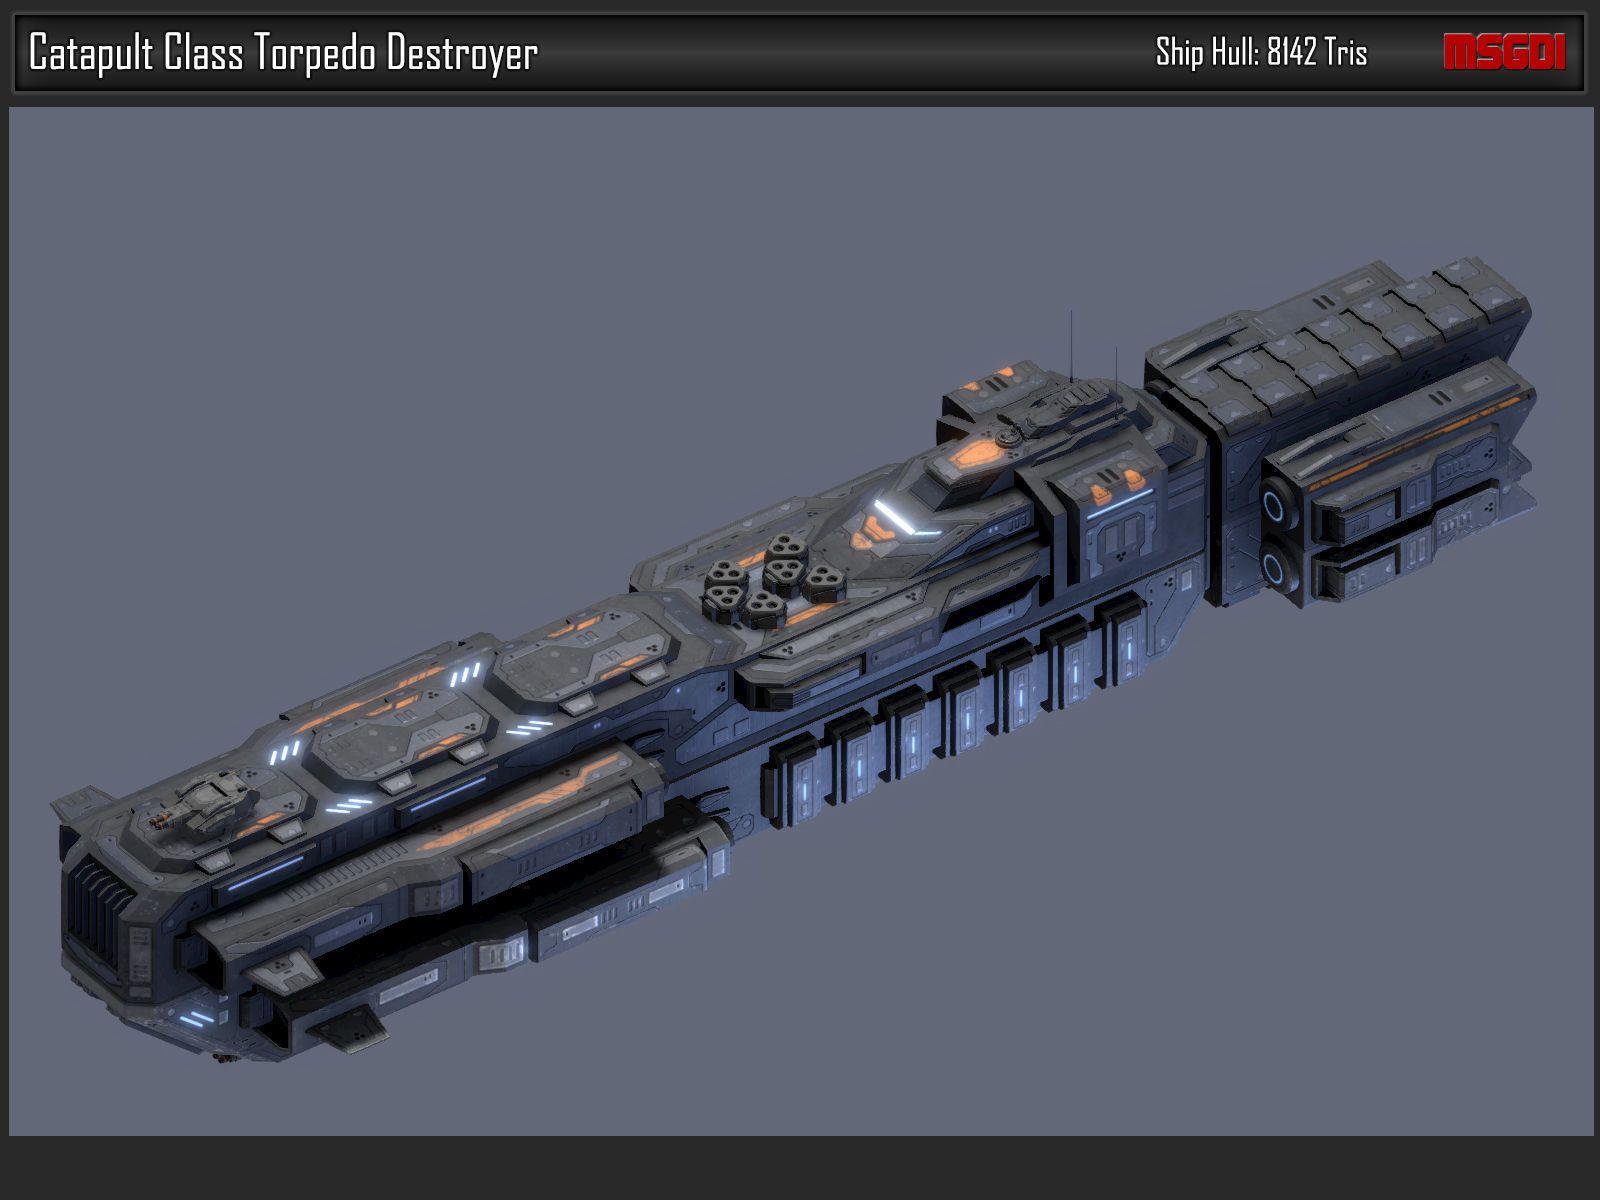 Scifi Torpedo Destroyer Catapult 3d Model Cgtrader Kosmicheskij